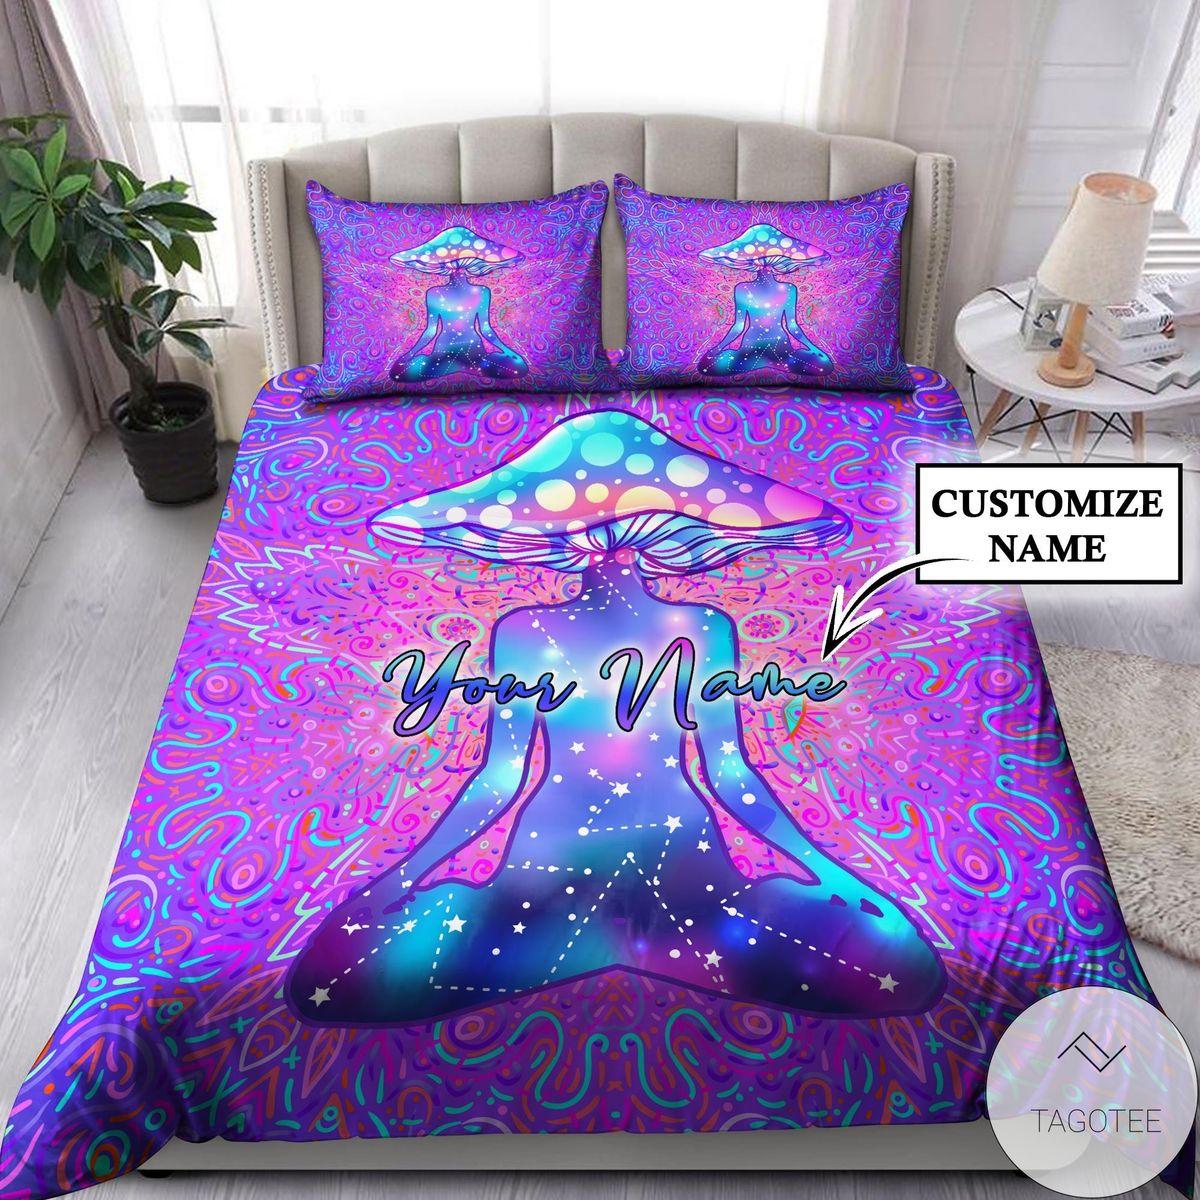 Fantastic Customize Name Mushroom Hippie Bedding Set